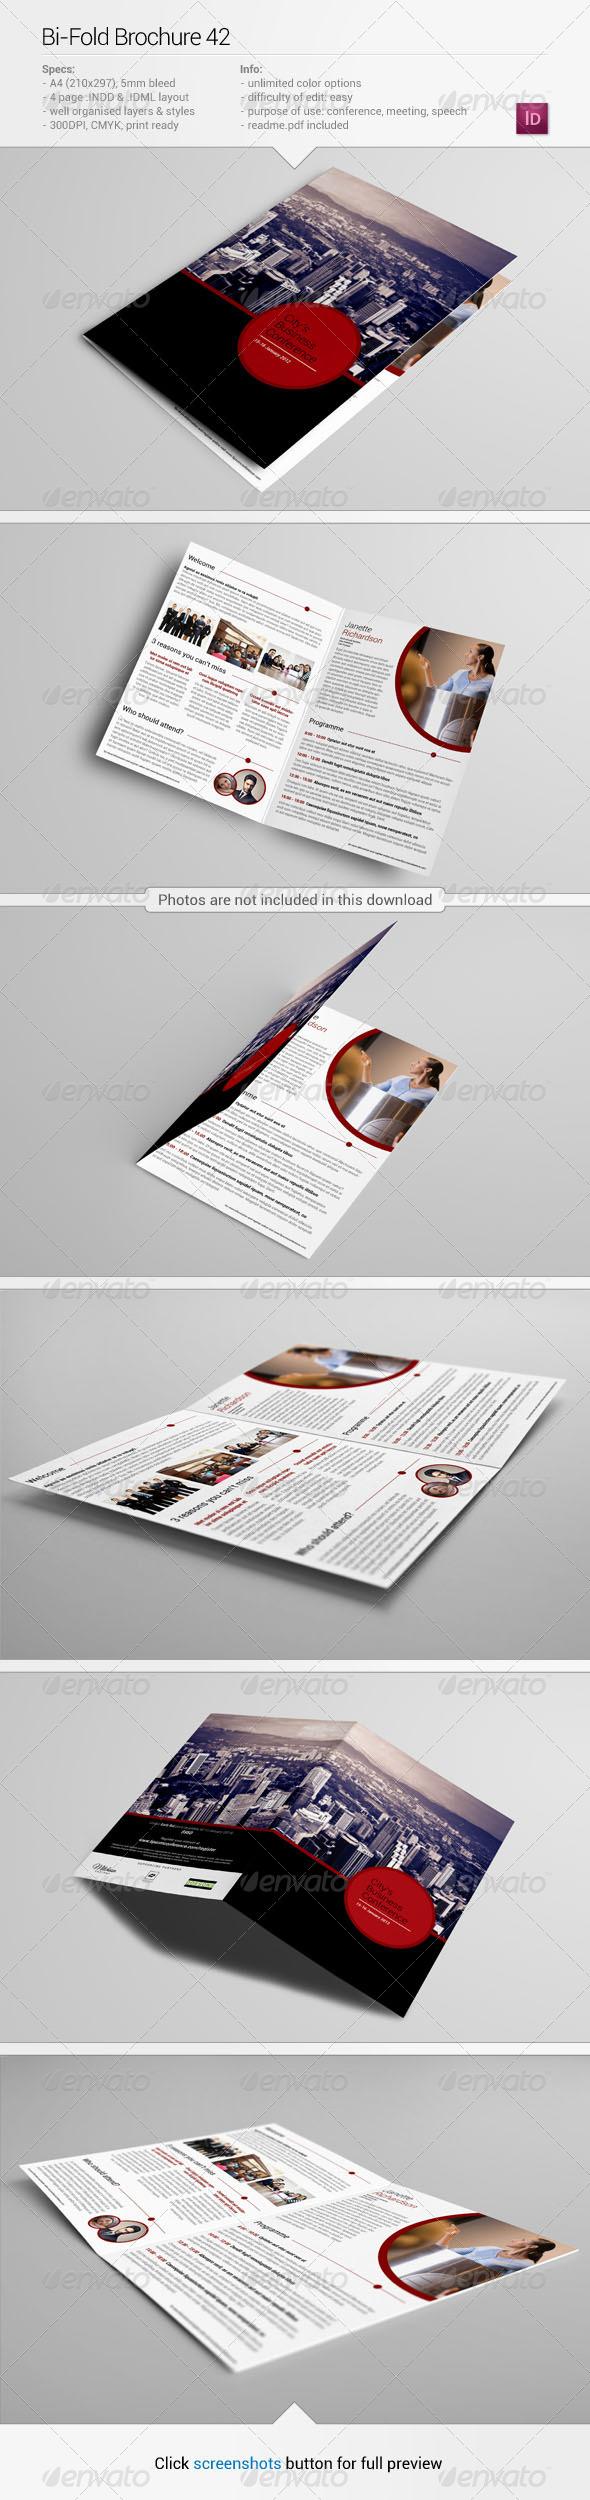 GraphicRiver Bi-Fold Brochure 42 6184397